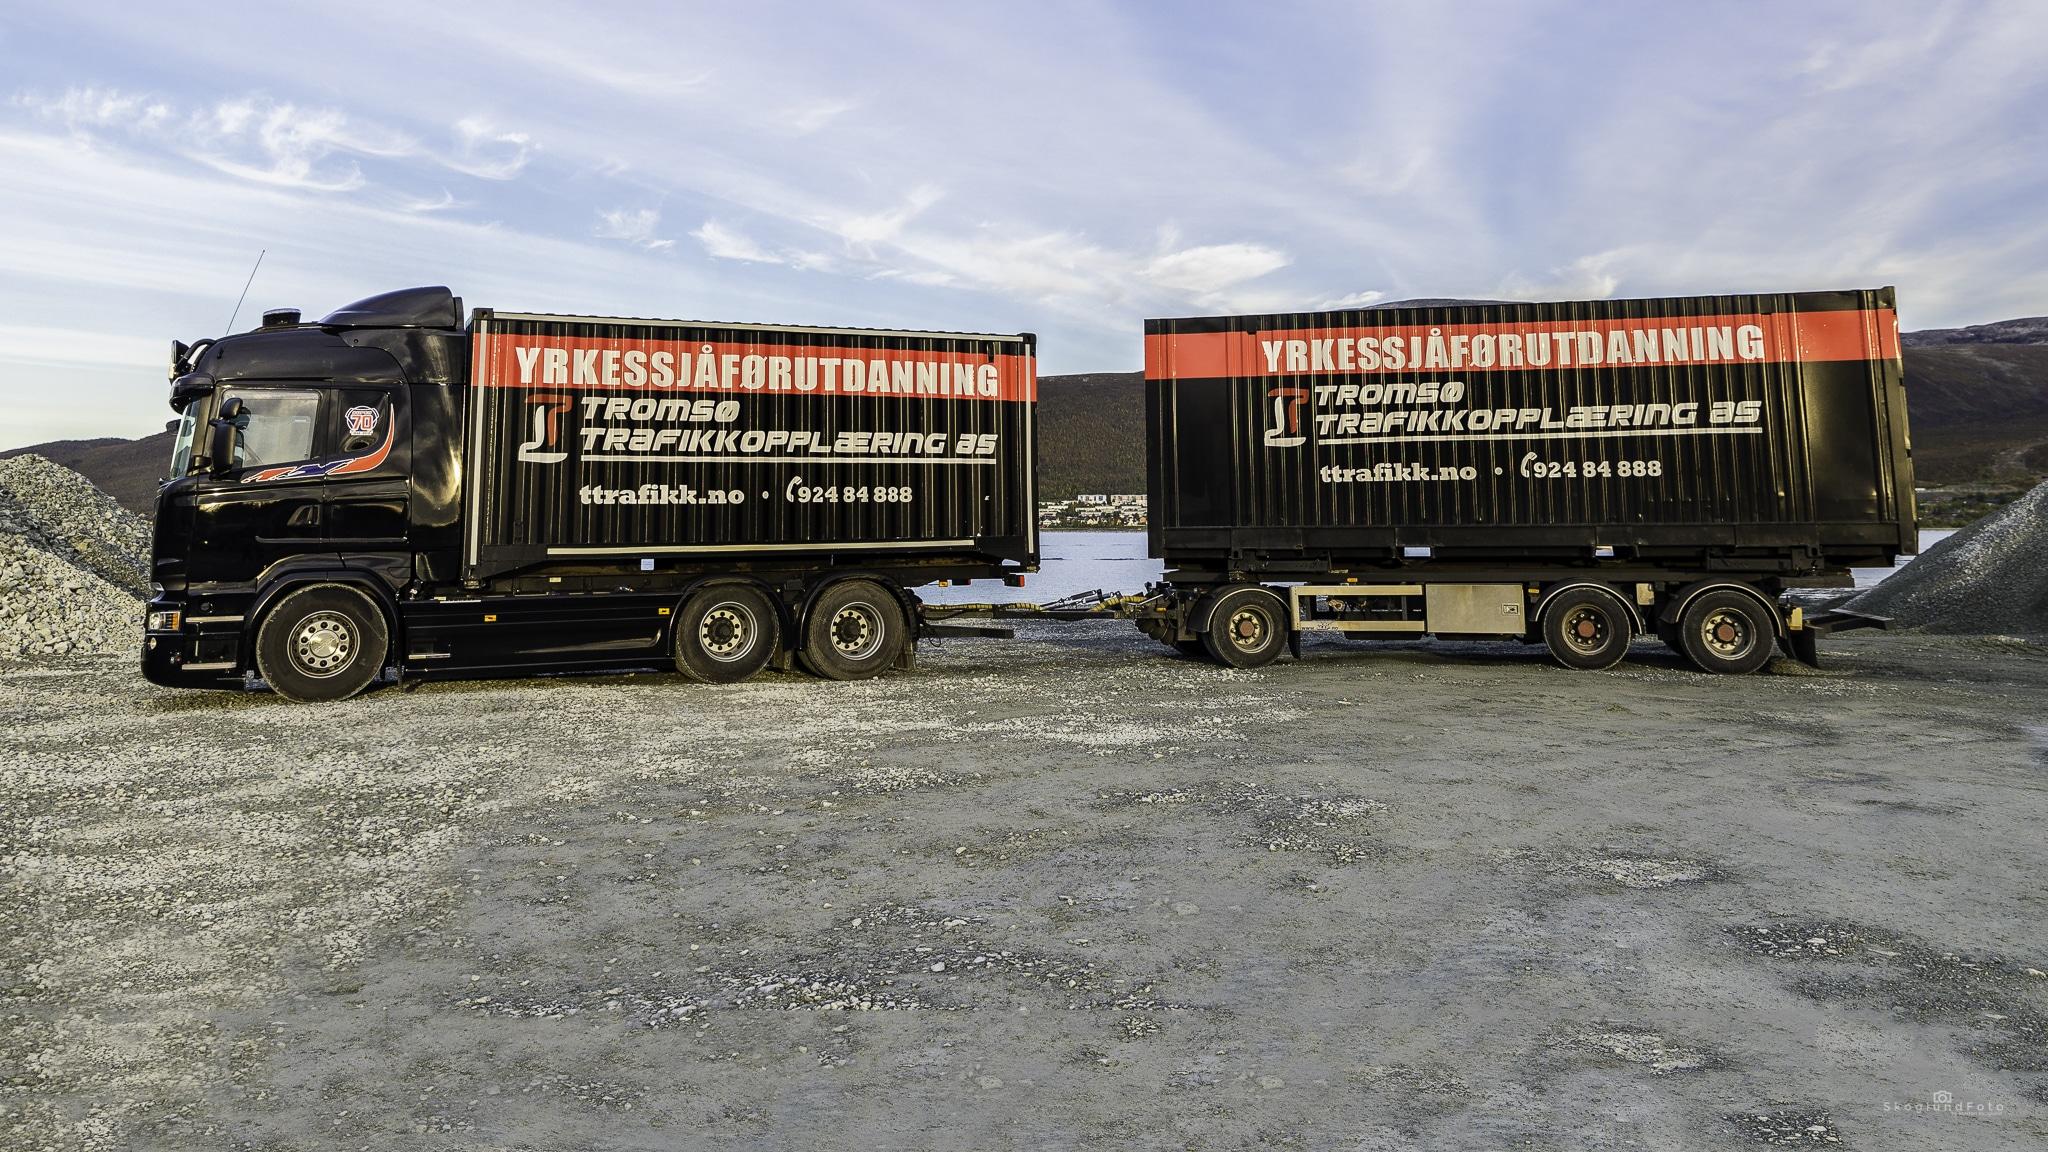 Tromsø Trafikkopplæring AS - _SF12571-Edit (1)